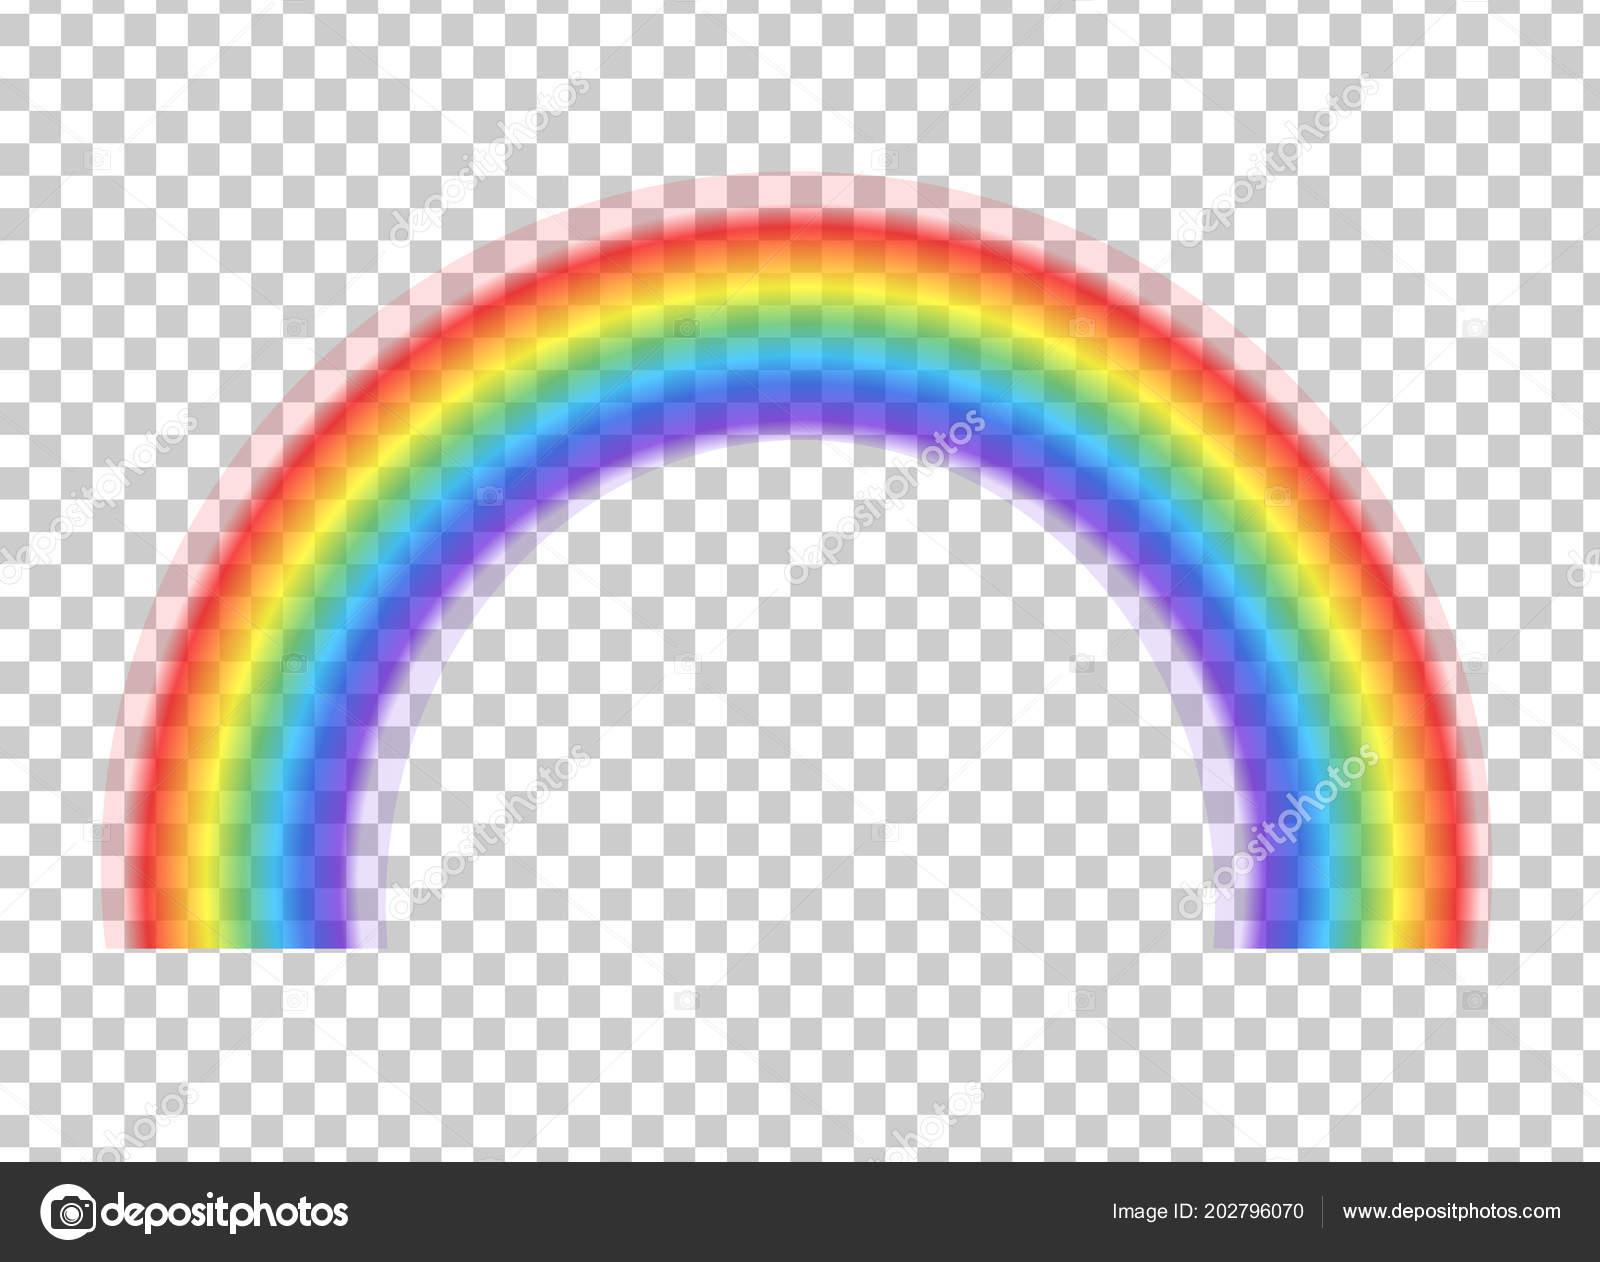 rainbow icon isolated transparent background spectrum fantasy